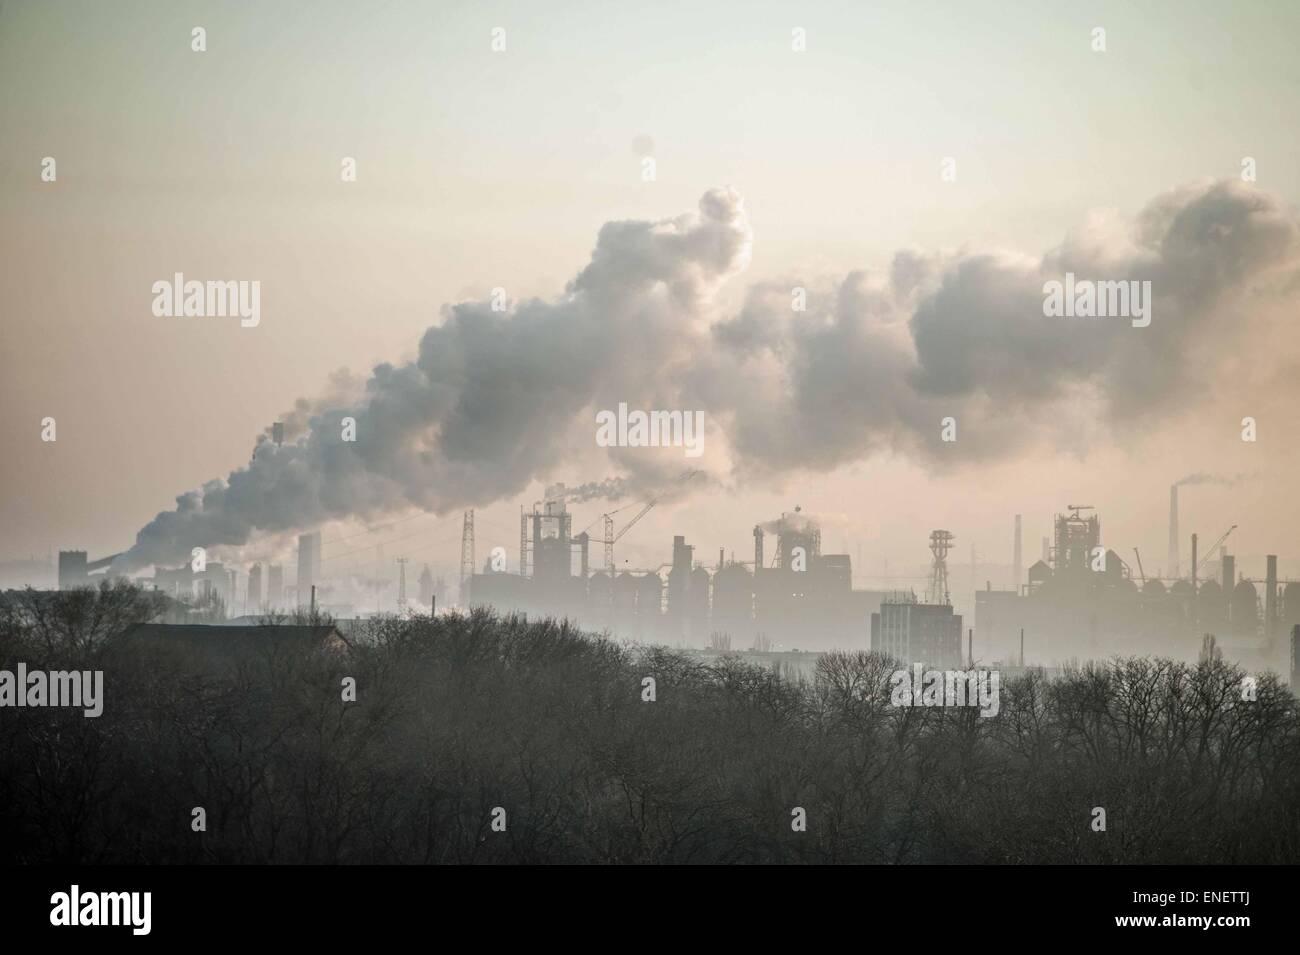 The Azovstal steel works in Mariupol, Ukraine. - Stock Image